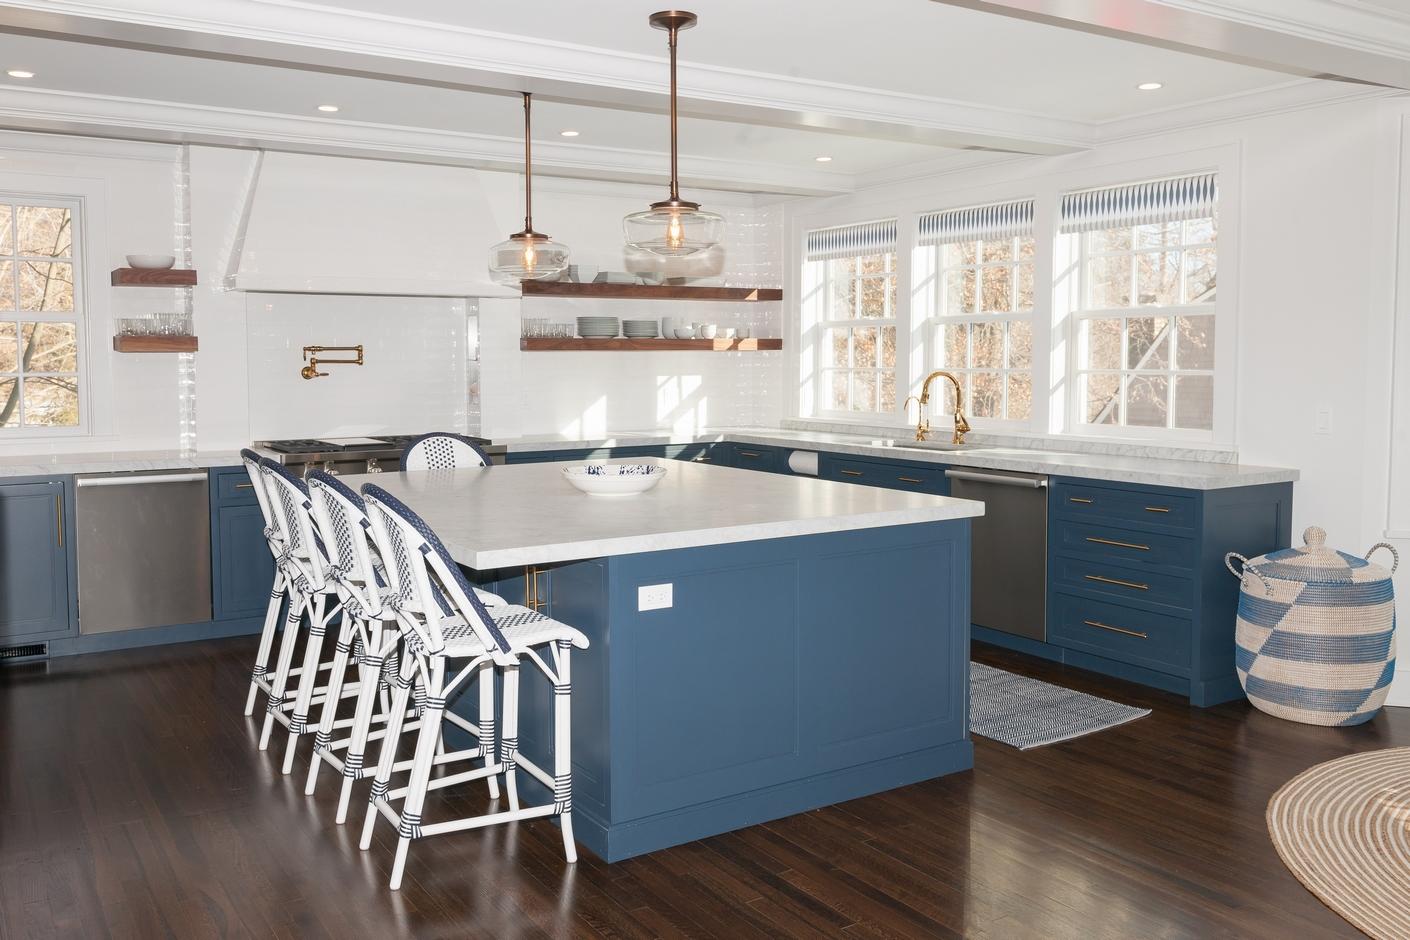 Vision Kitchen And Bath Nj